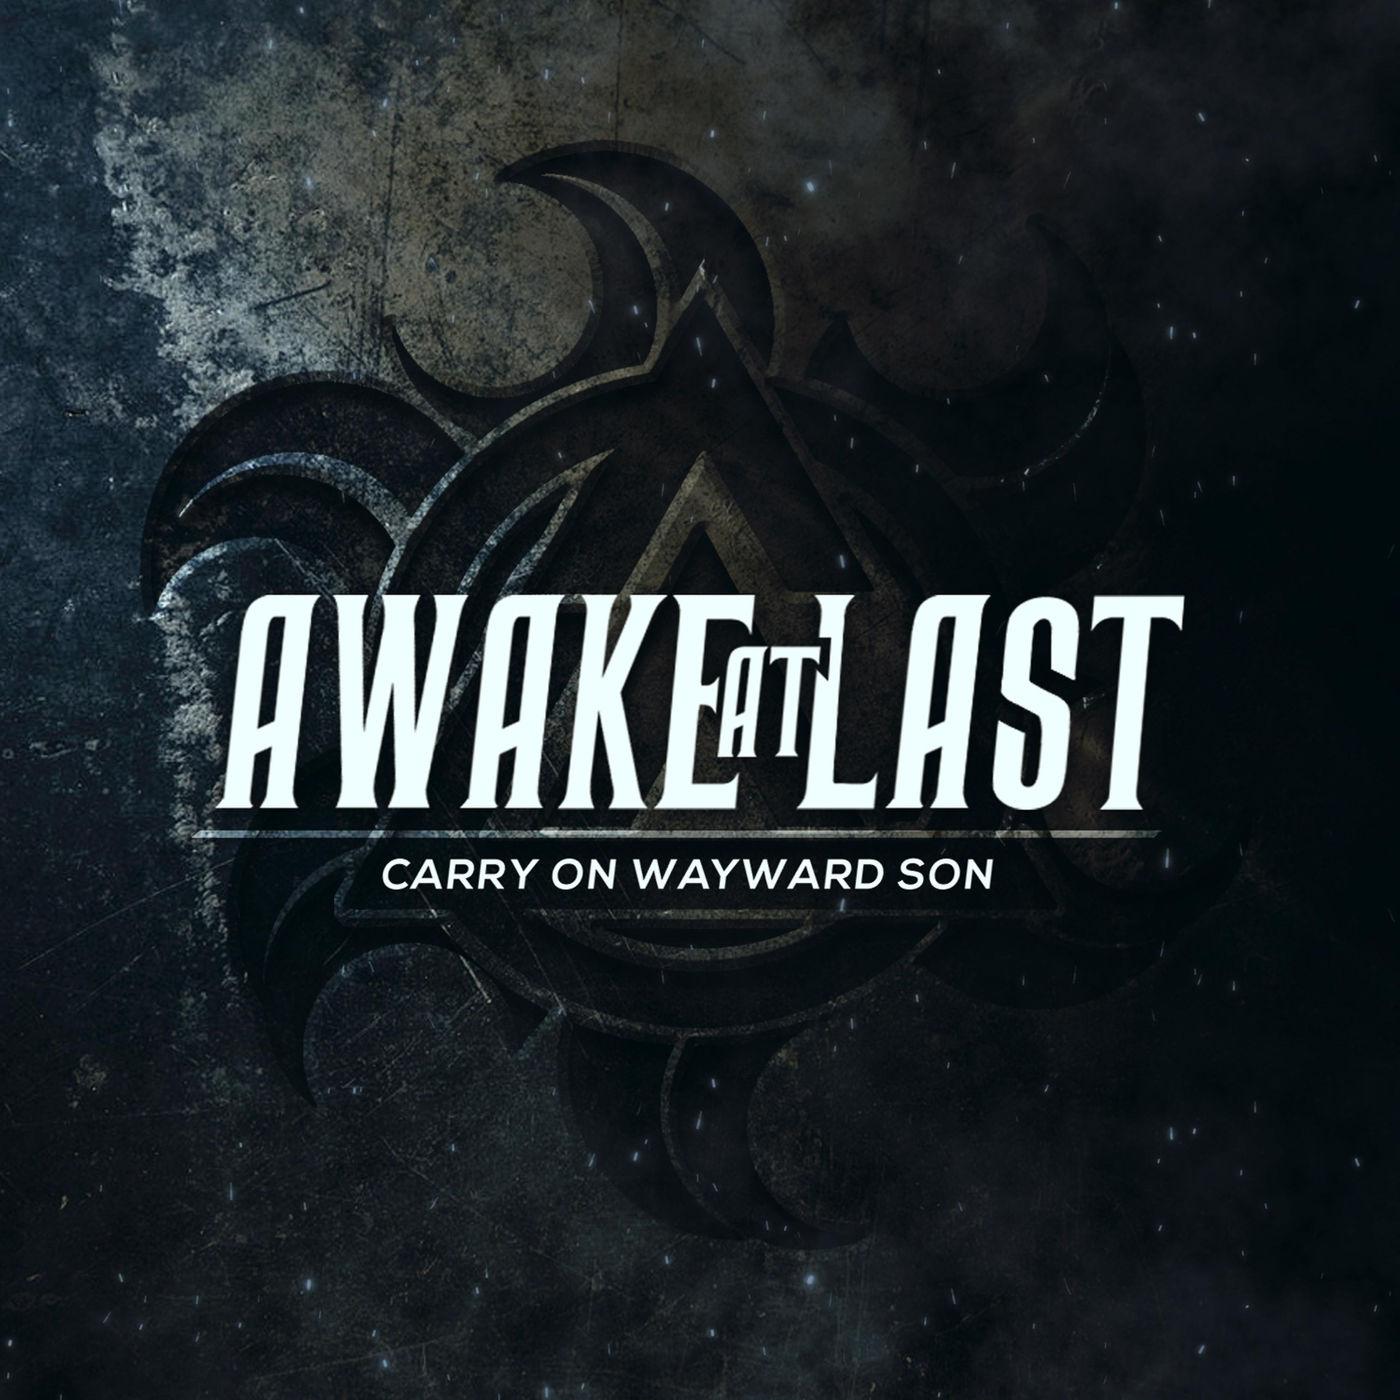 Awake At Last - Carry on Wayward Son [single] (2020)